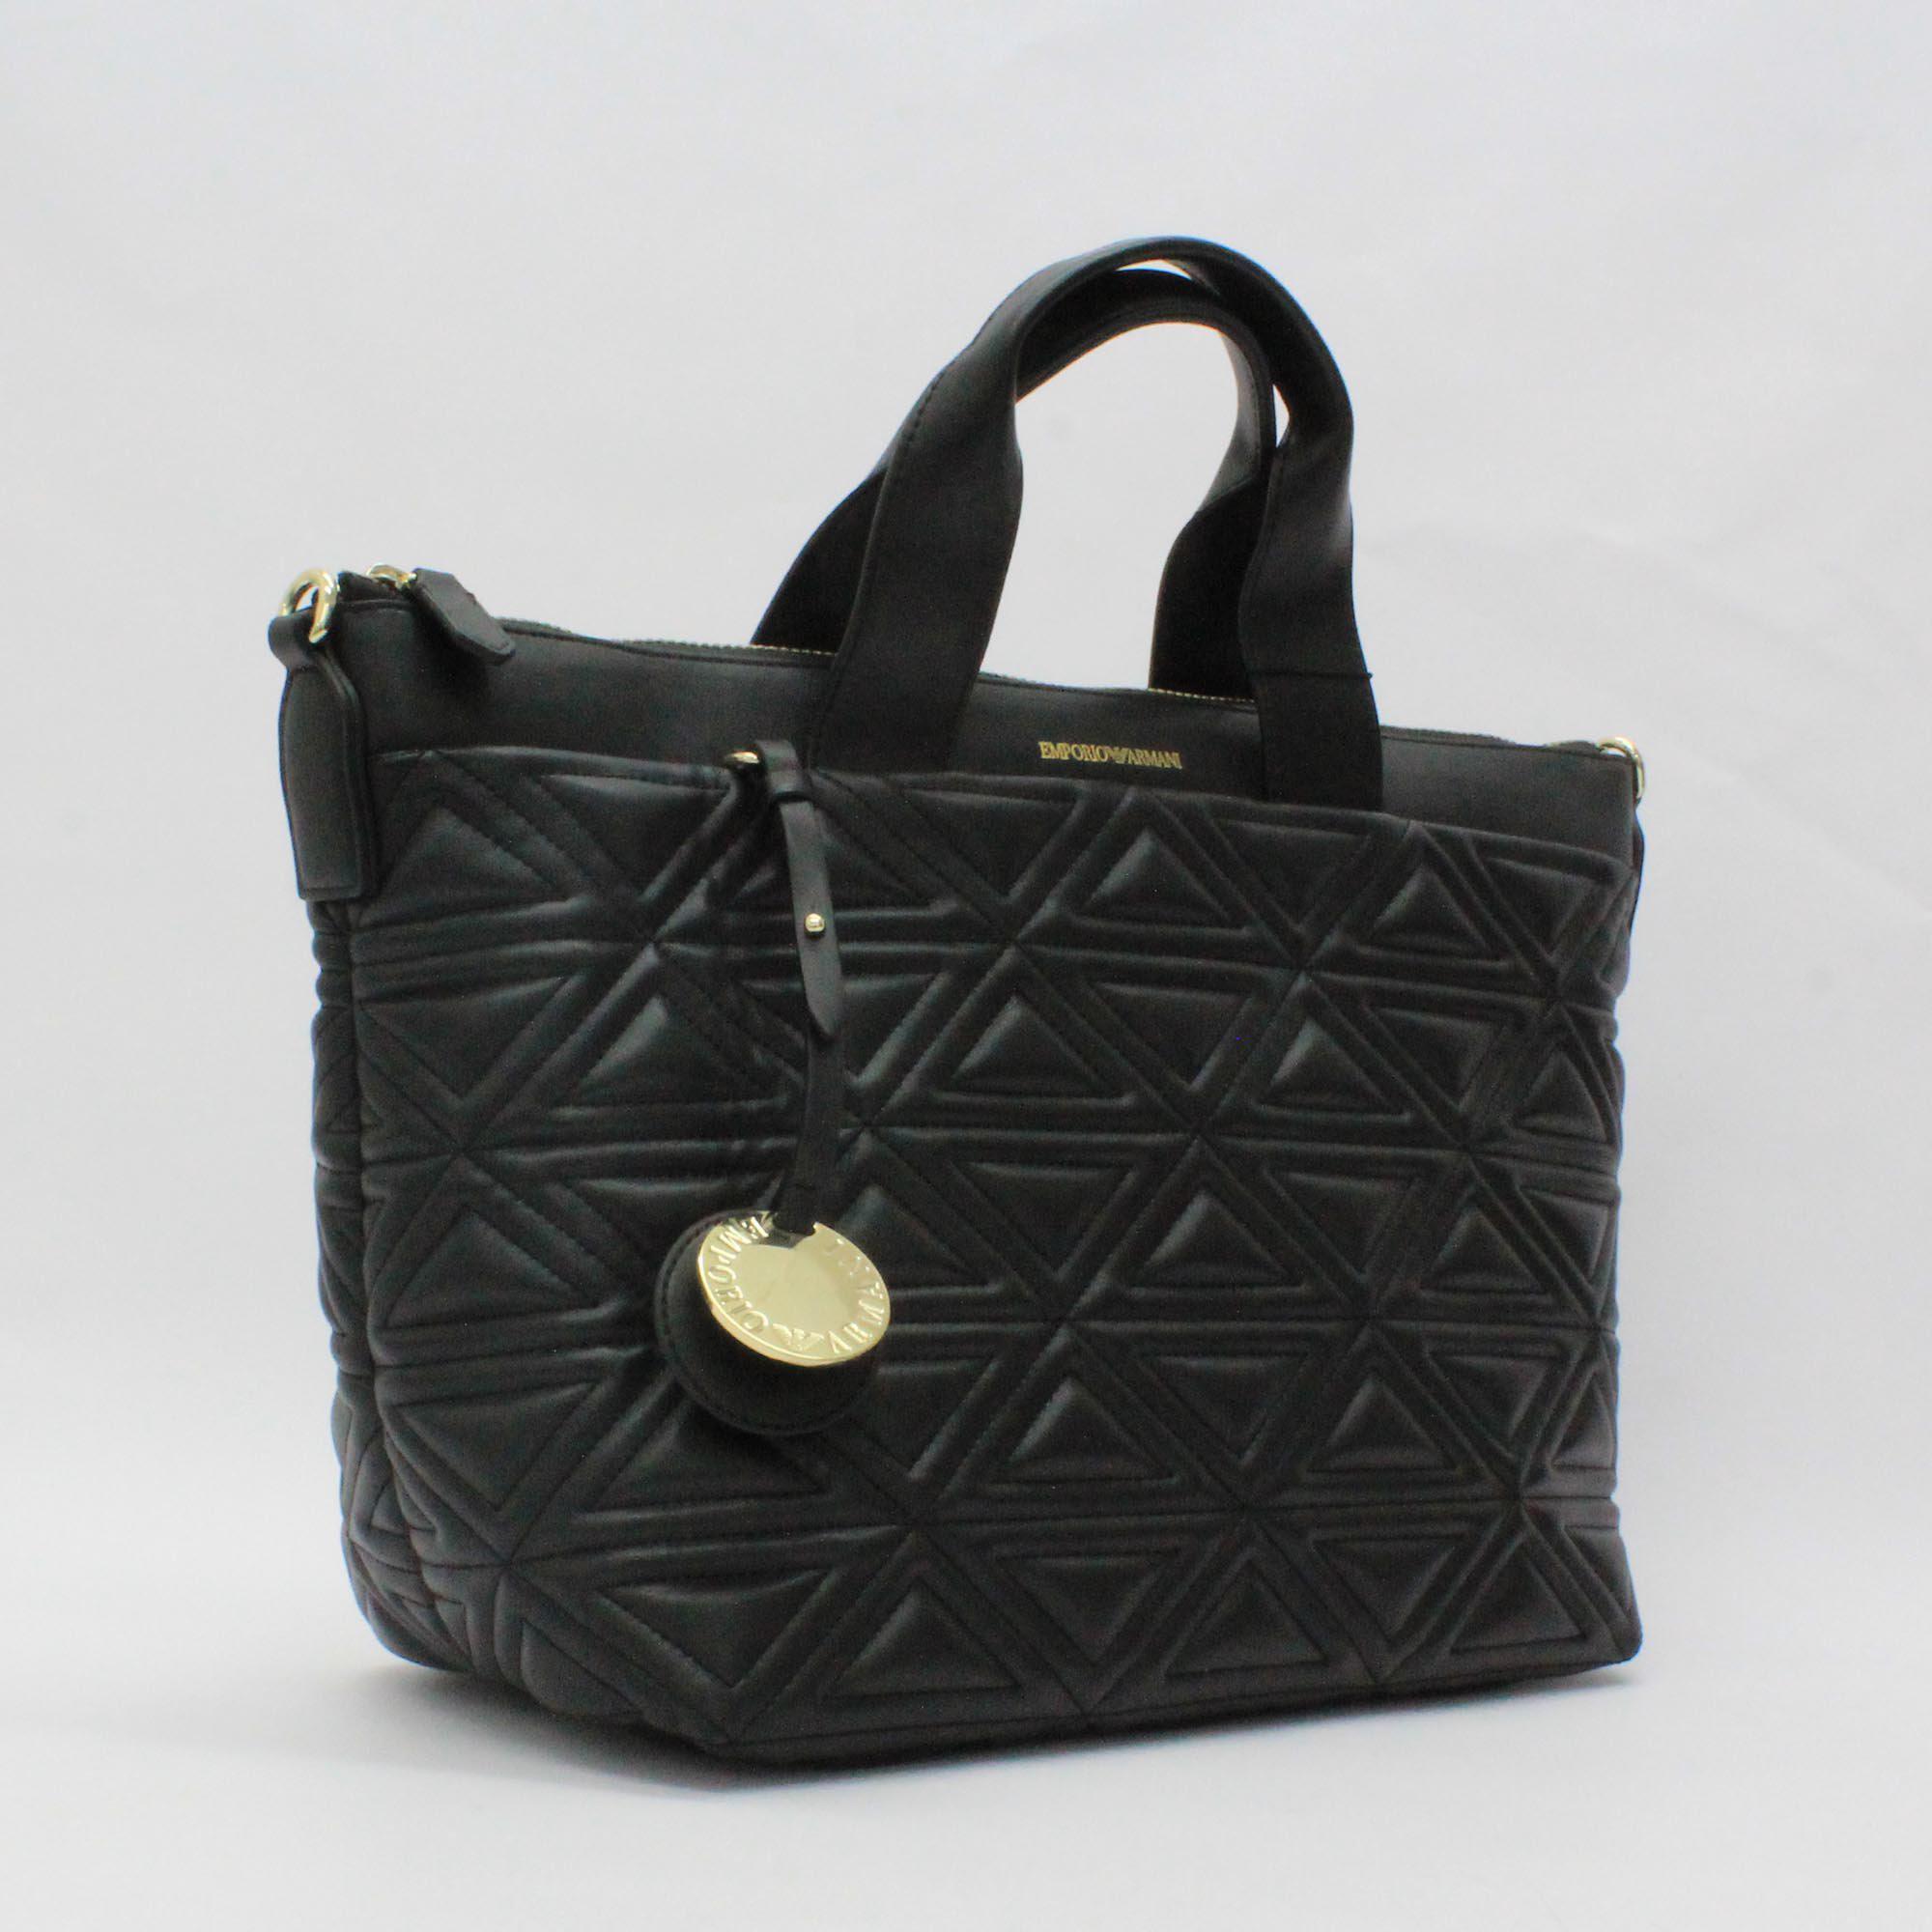 Armani - Emporio Triangle Quilt Bag Black - Lyst. View fullscreen 547c0360d1666